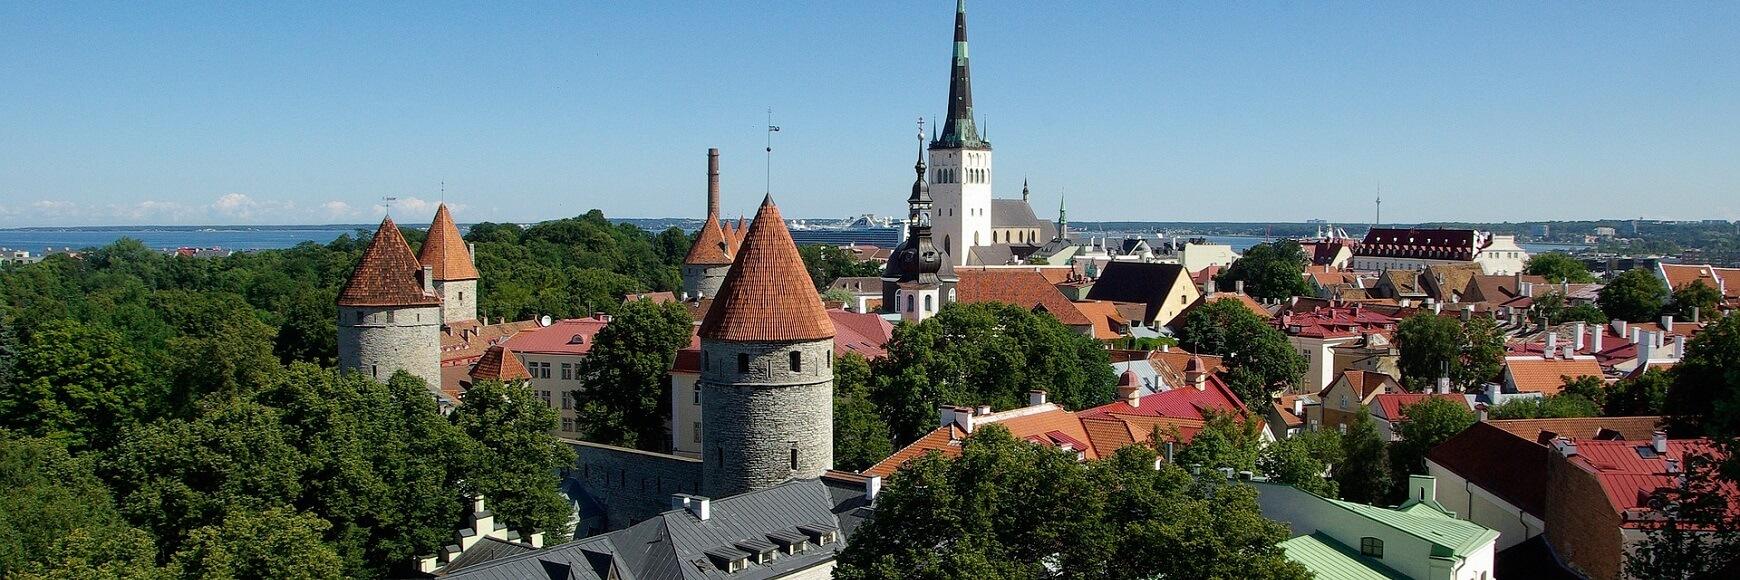 noleggio barche Estonia